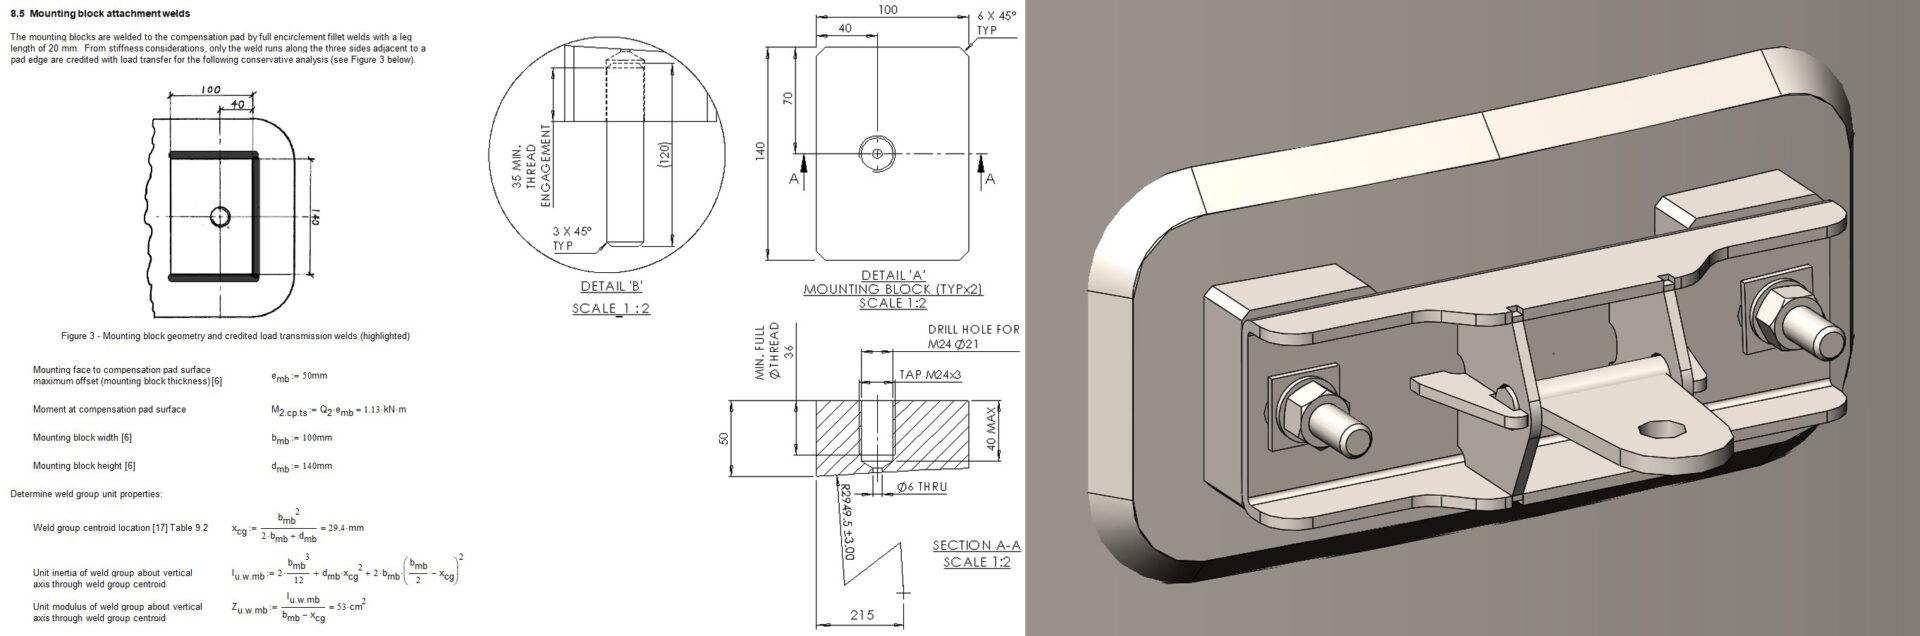 design ground up - 9017AlimakCalc